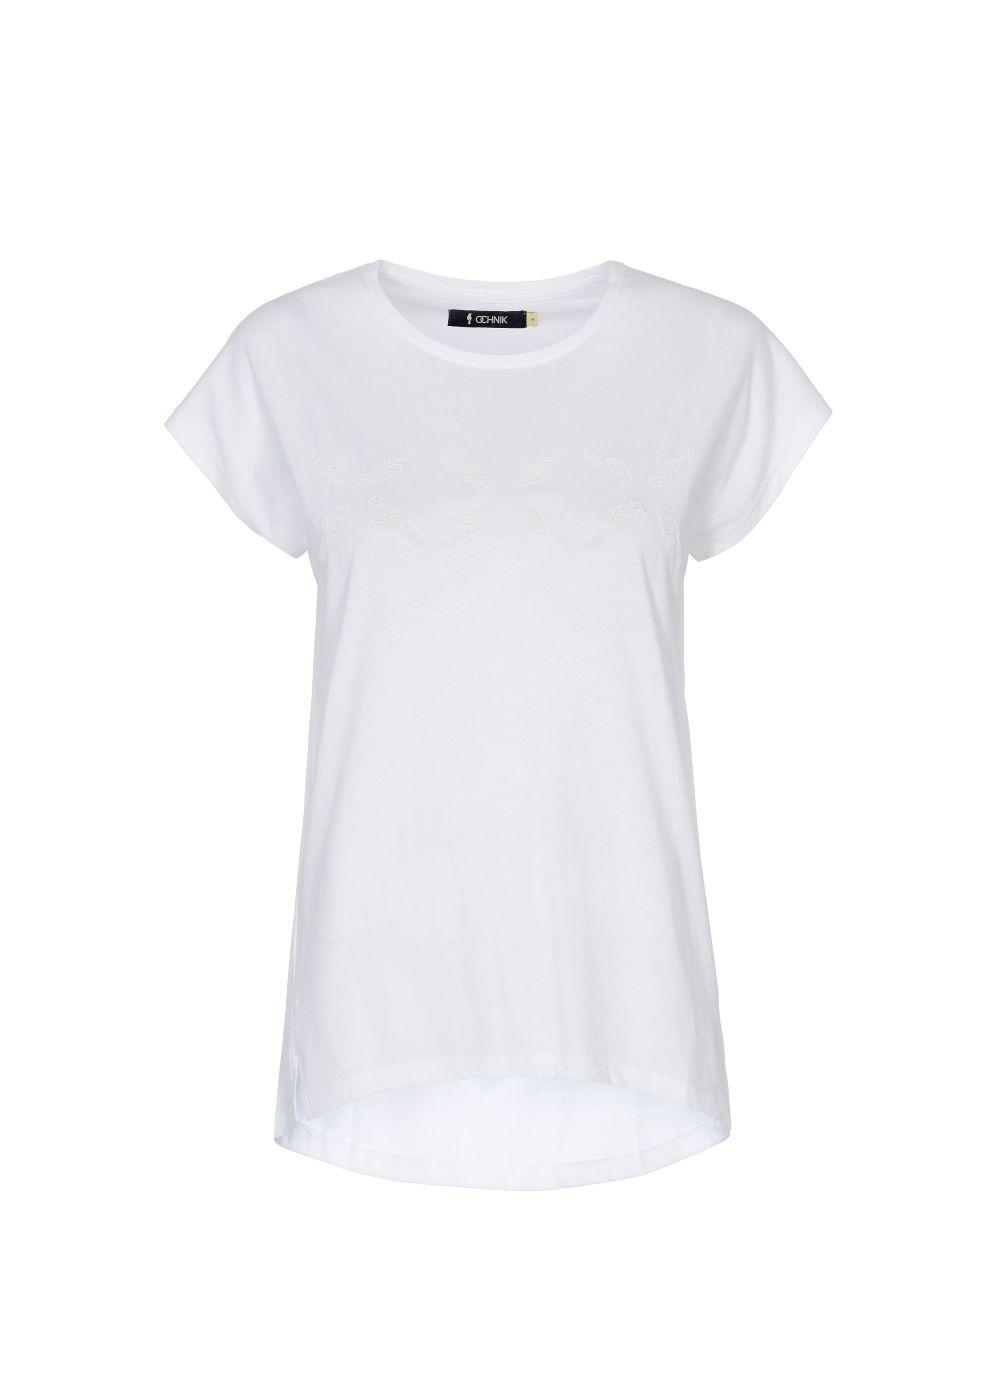 T-shirt damski TSHDT-0049-11(W20)